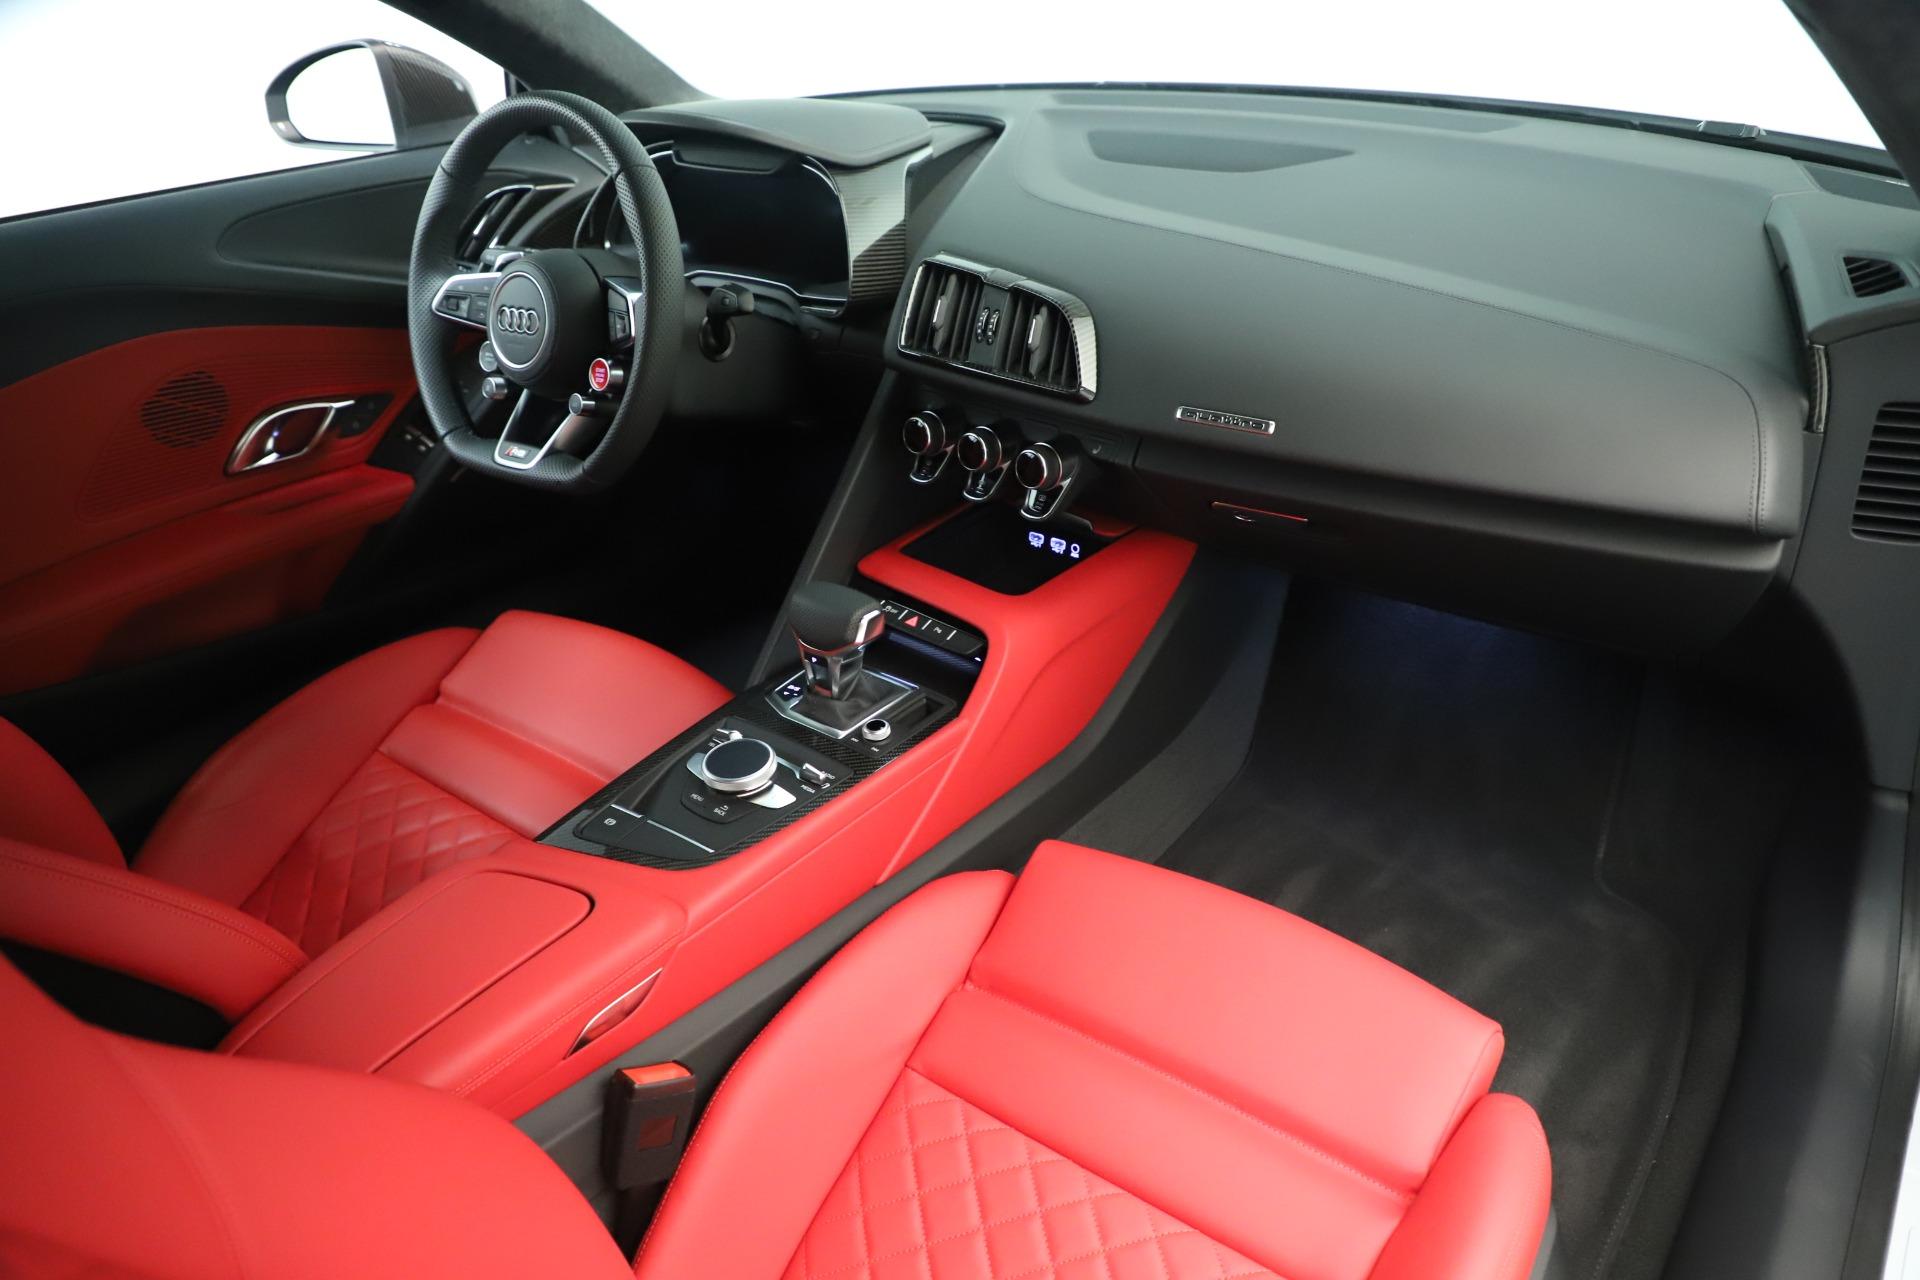 Used 2018 Audi R8 5.2 quattro V10 Plus For Sale In Greenwich, CT 3360_p18